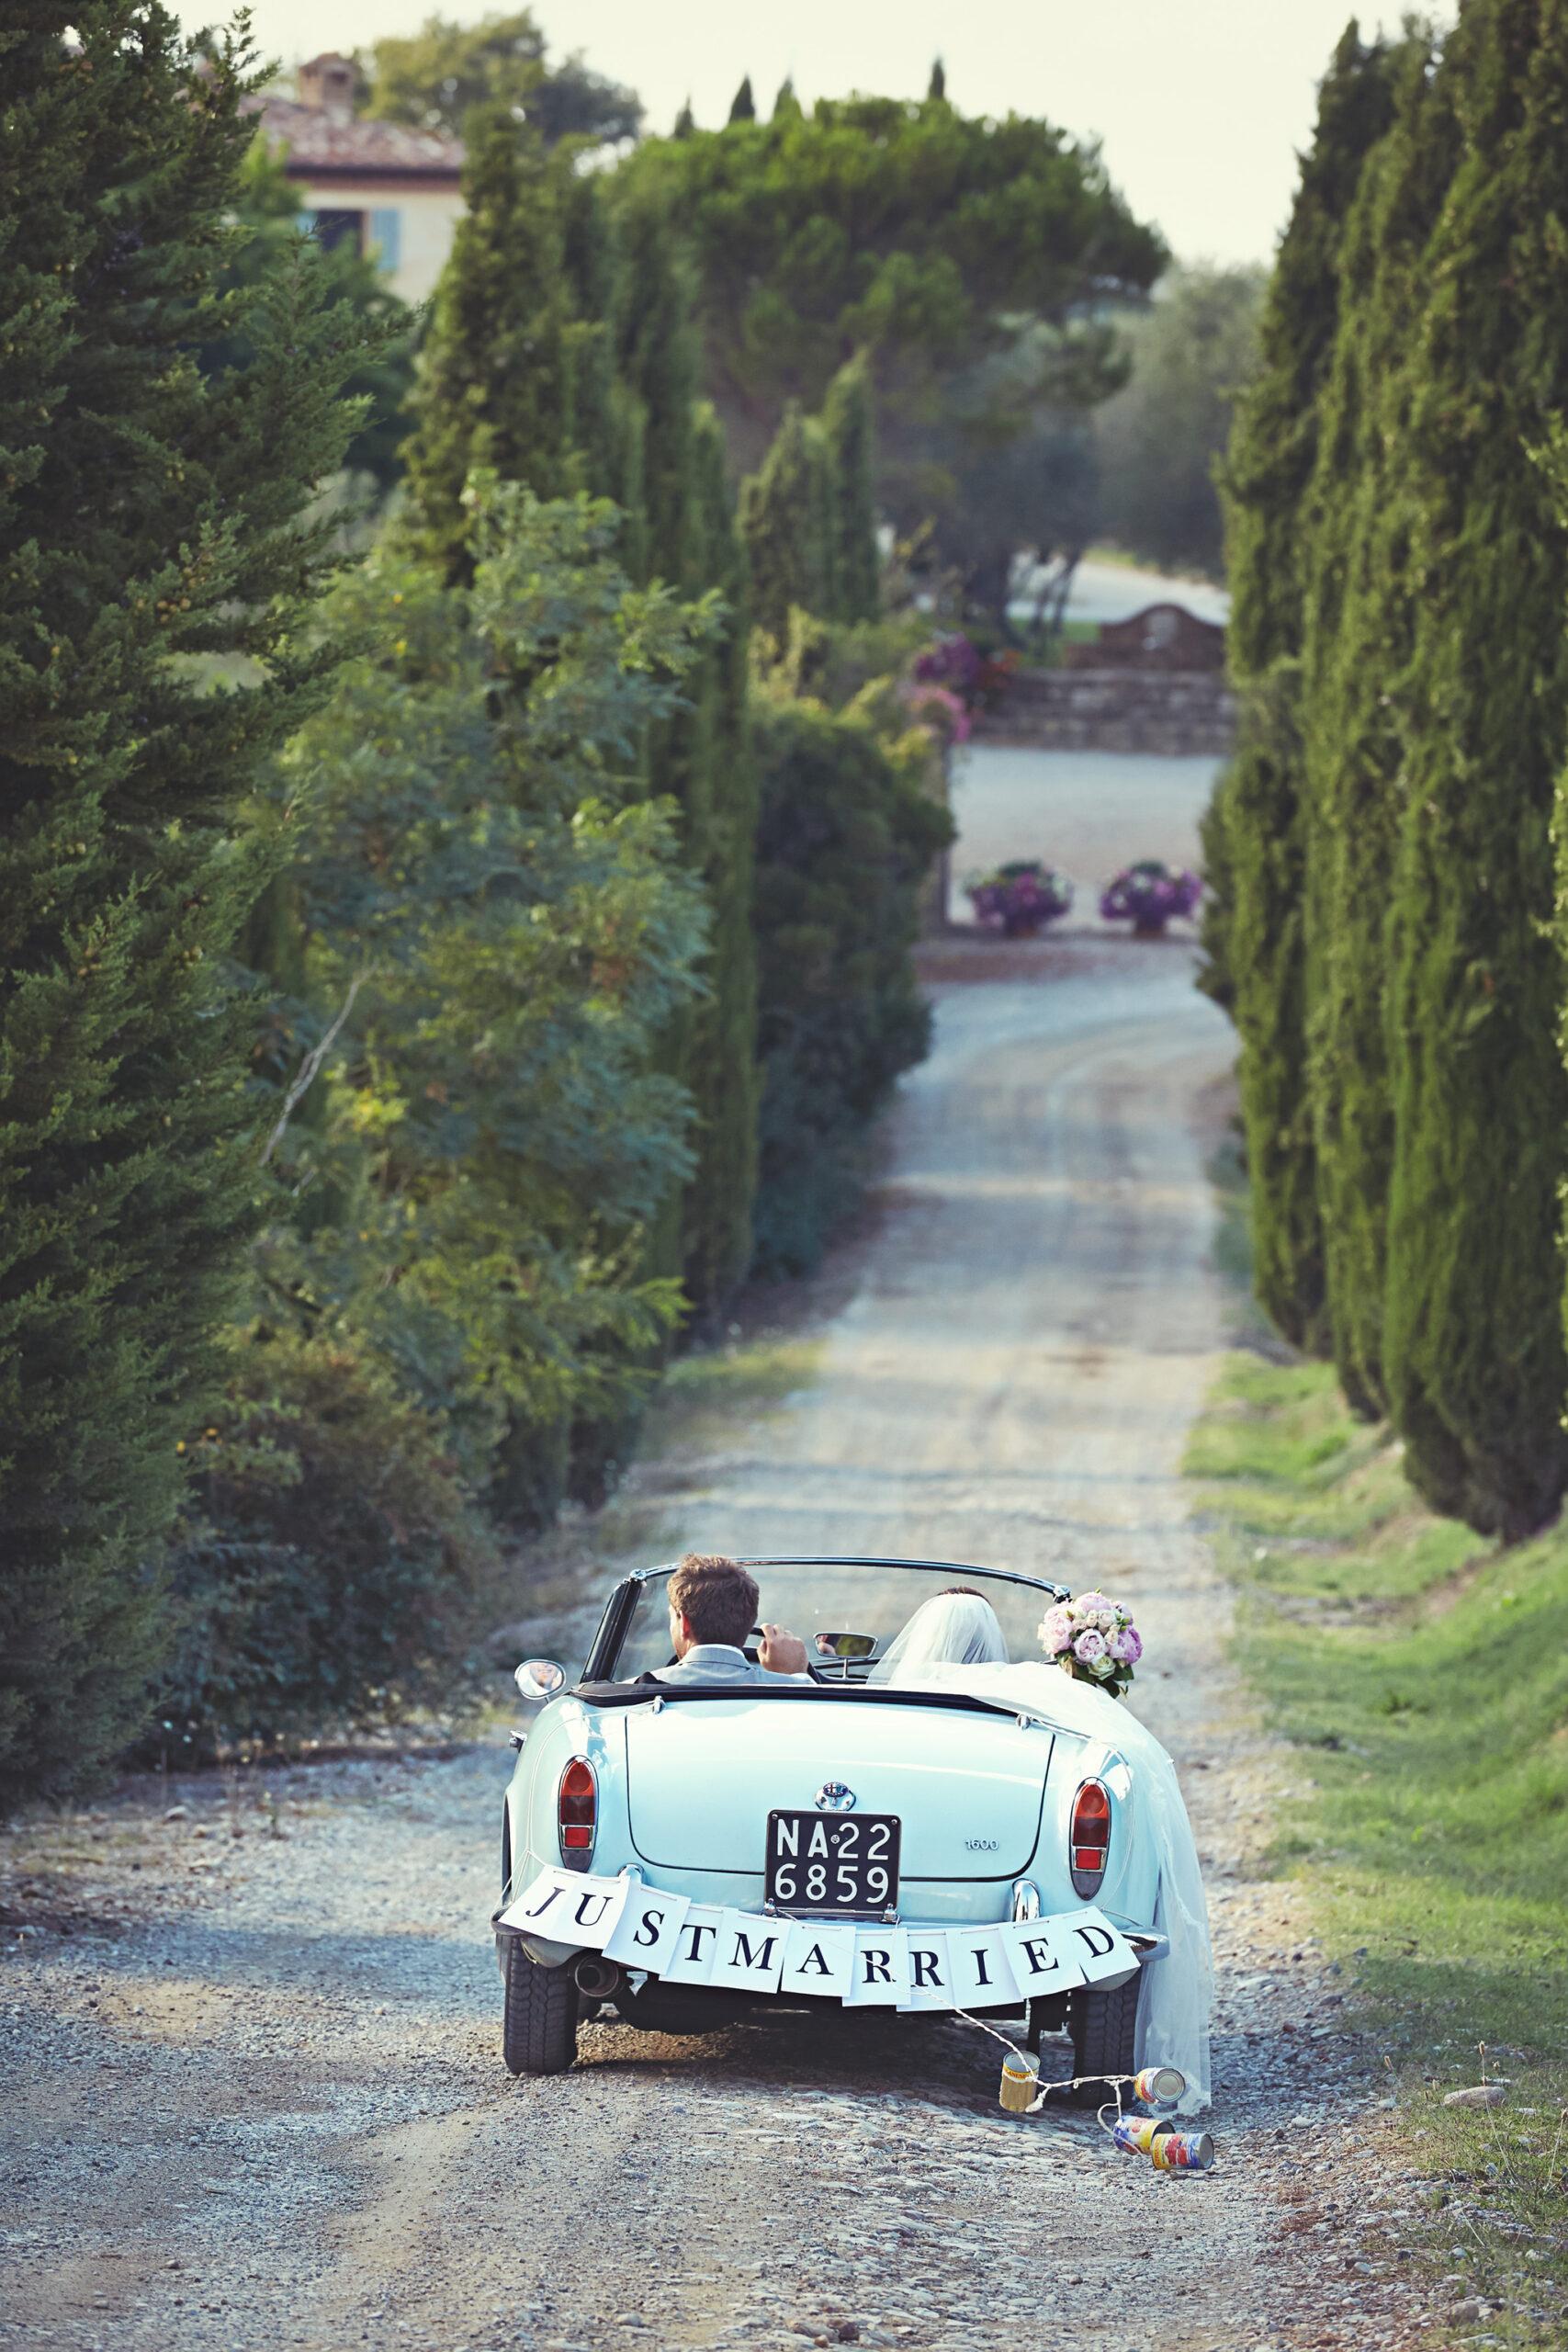 Honeymoon vintage car